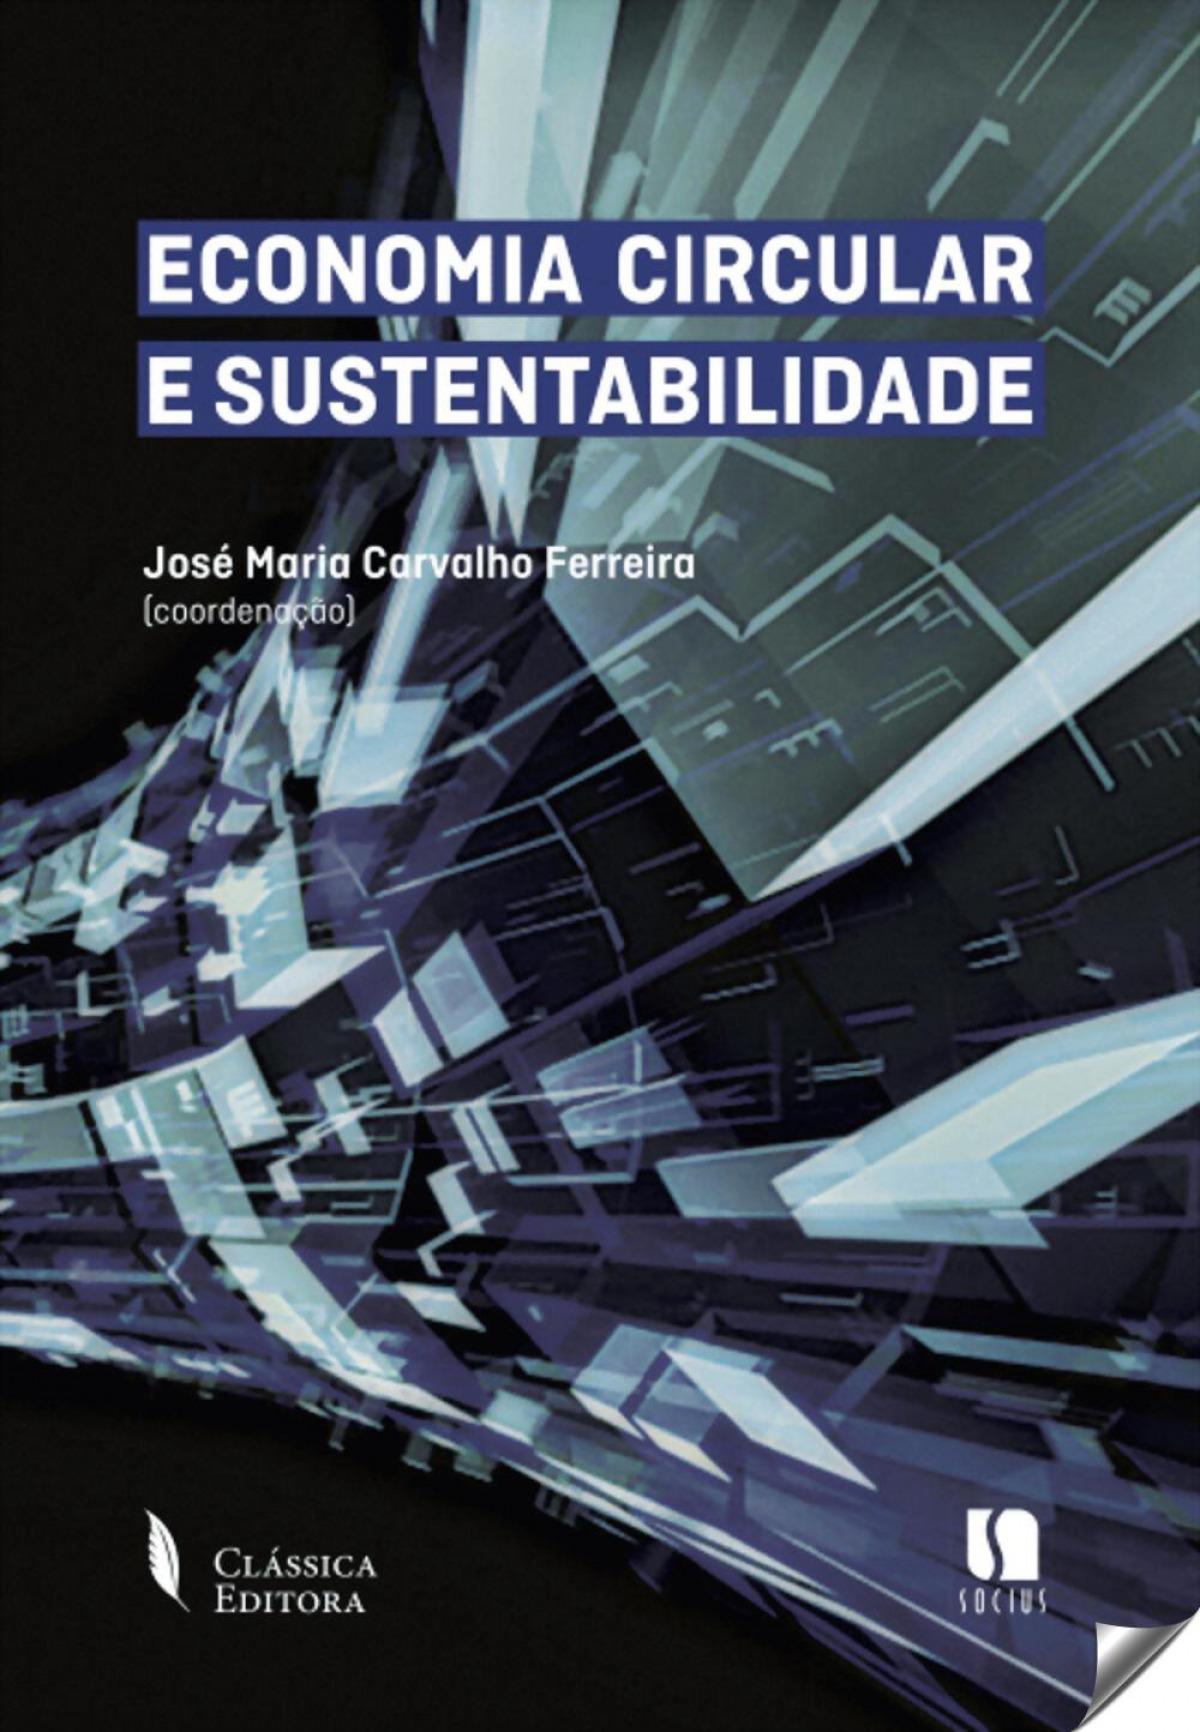 economia circular e sustentabilidade